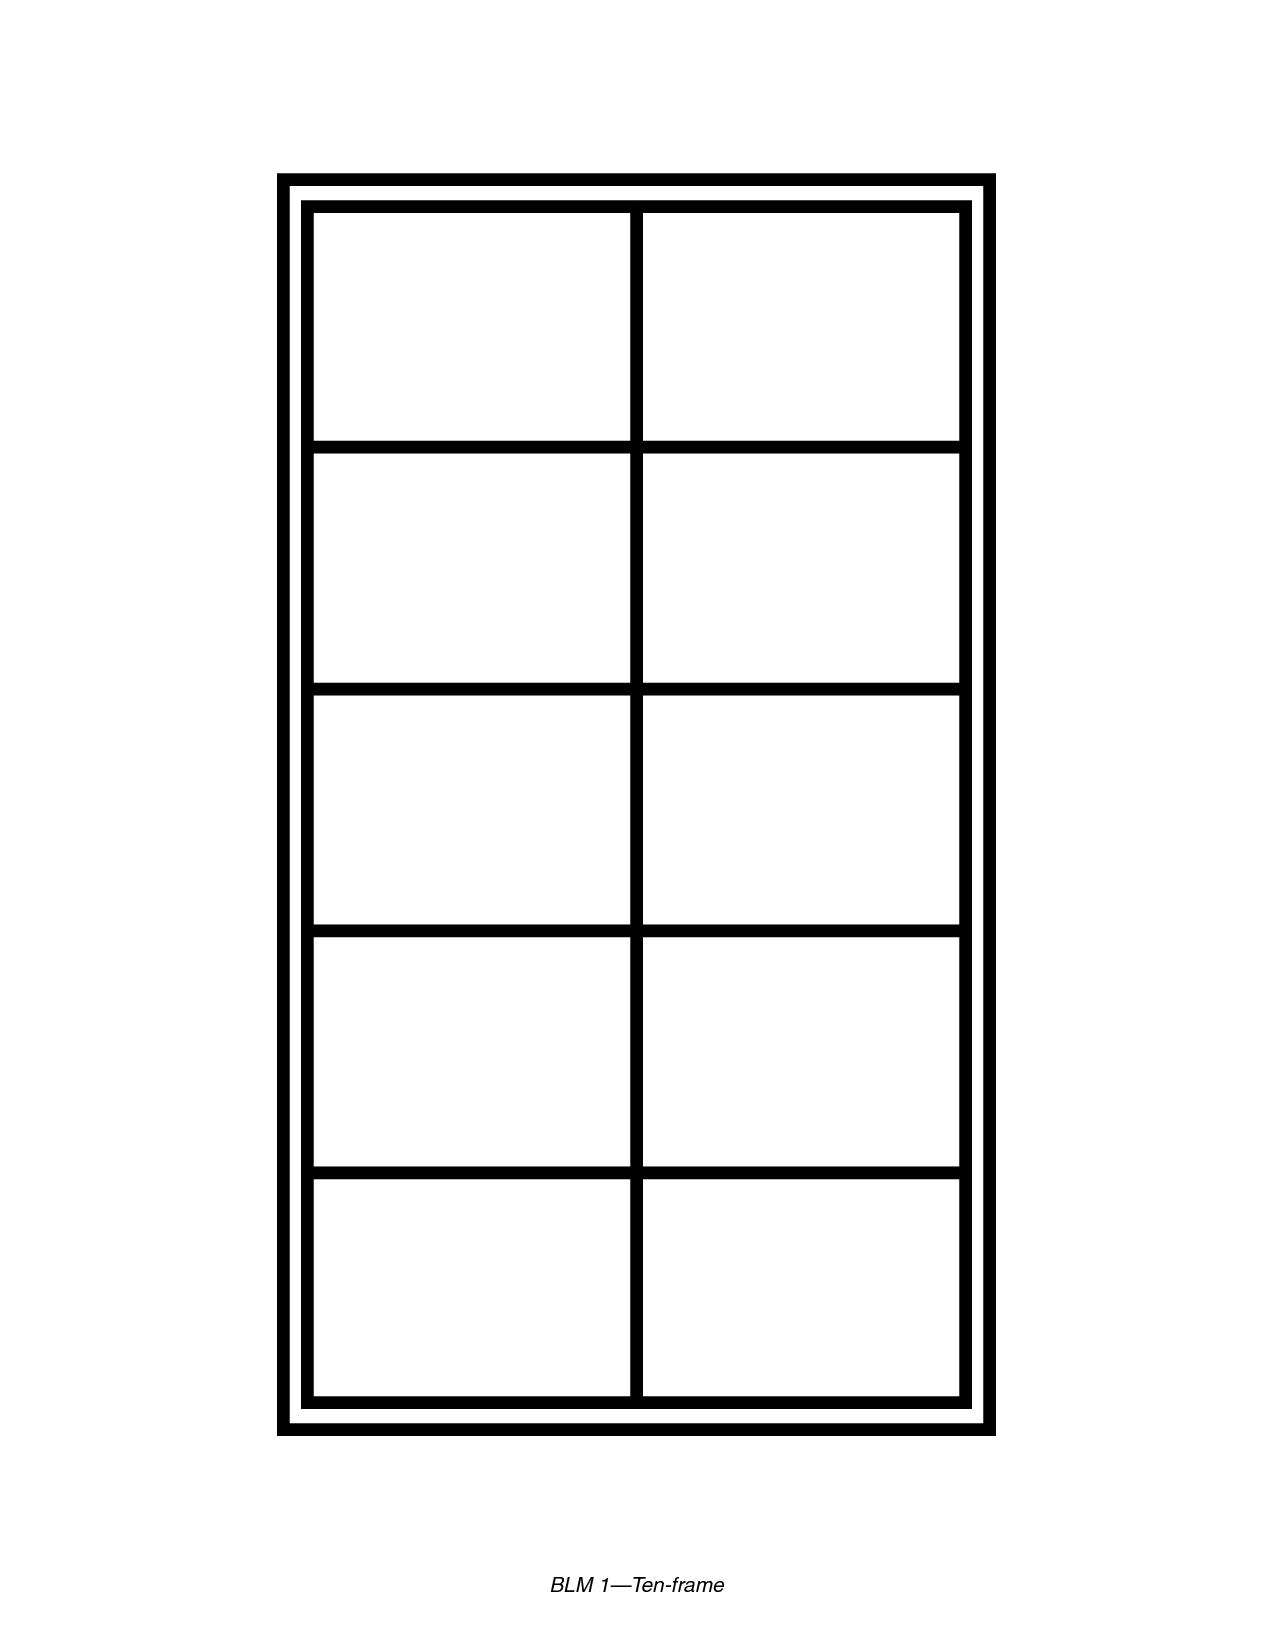 Square clipart ten Clip Clip Ten Art Blank